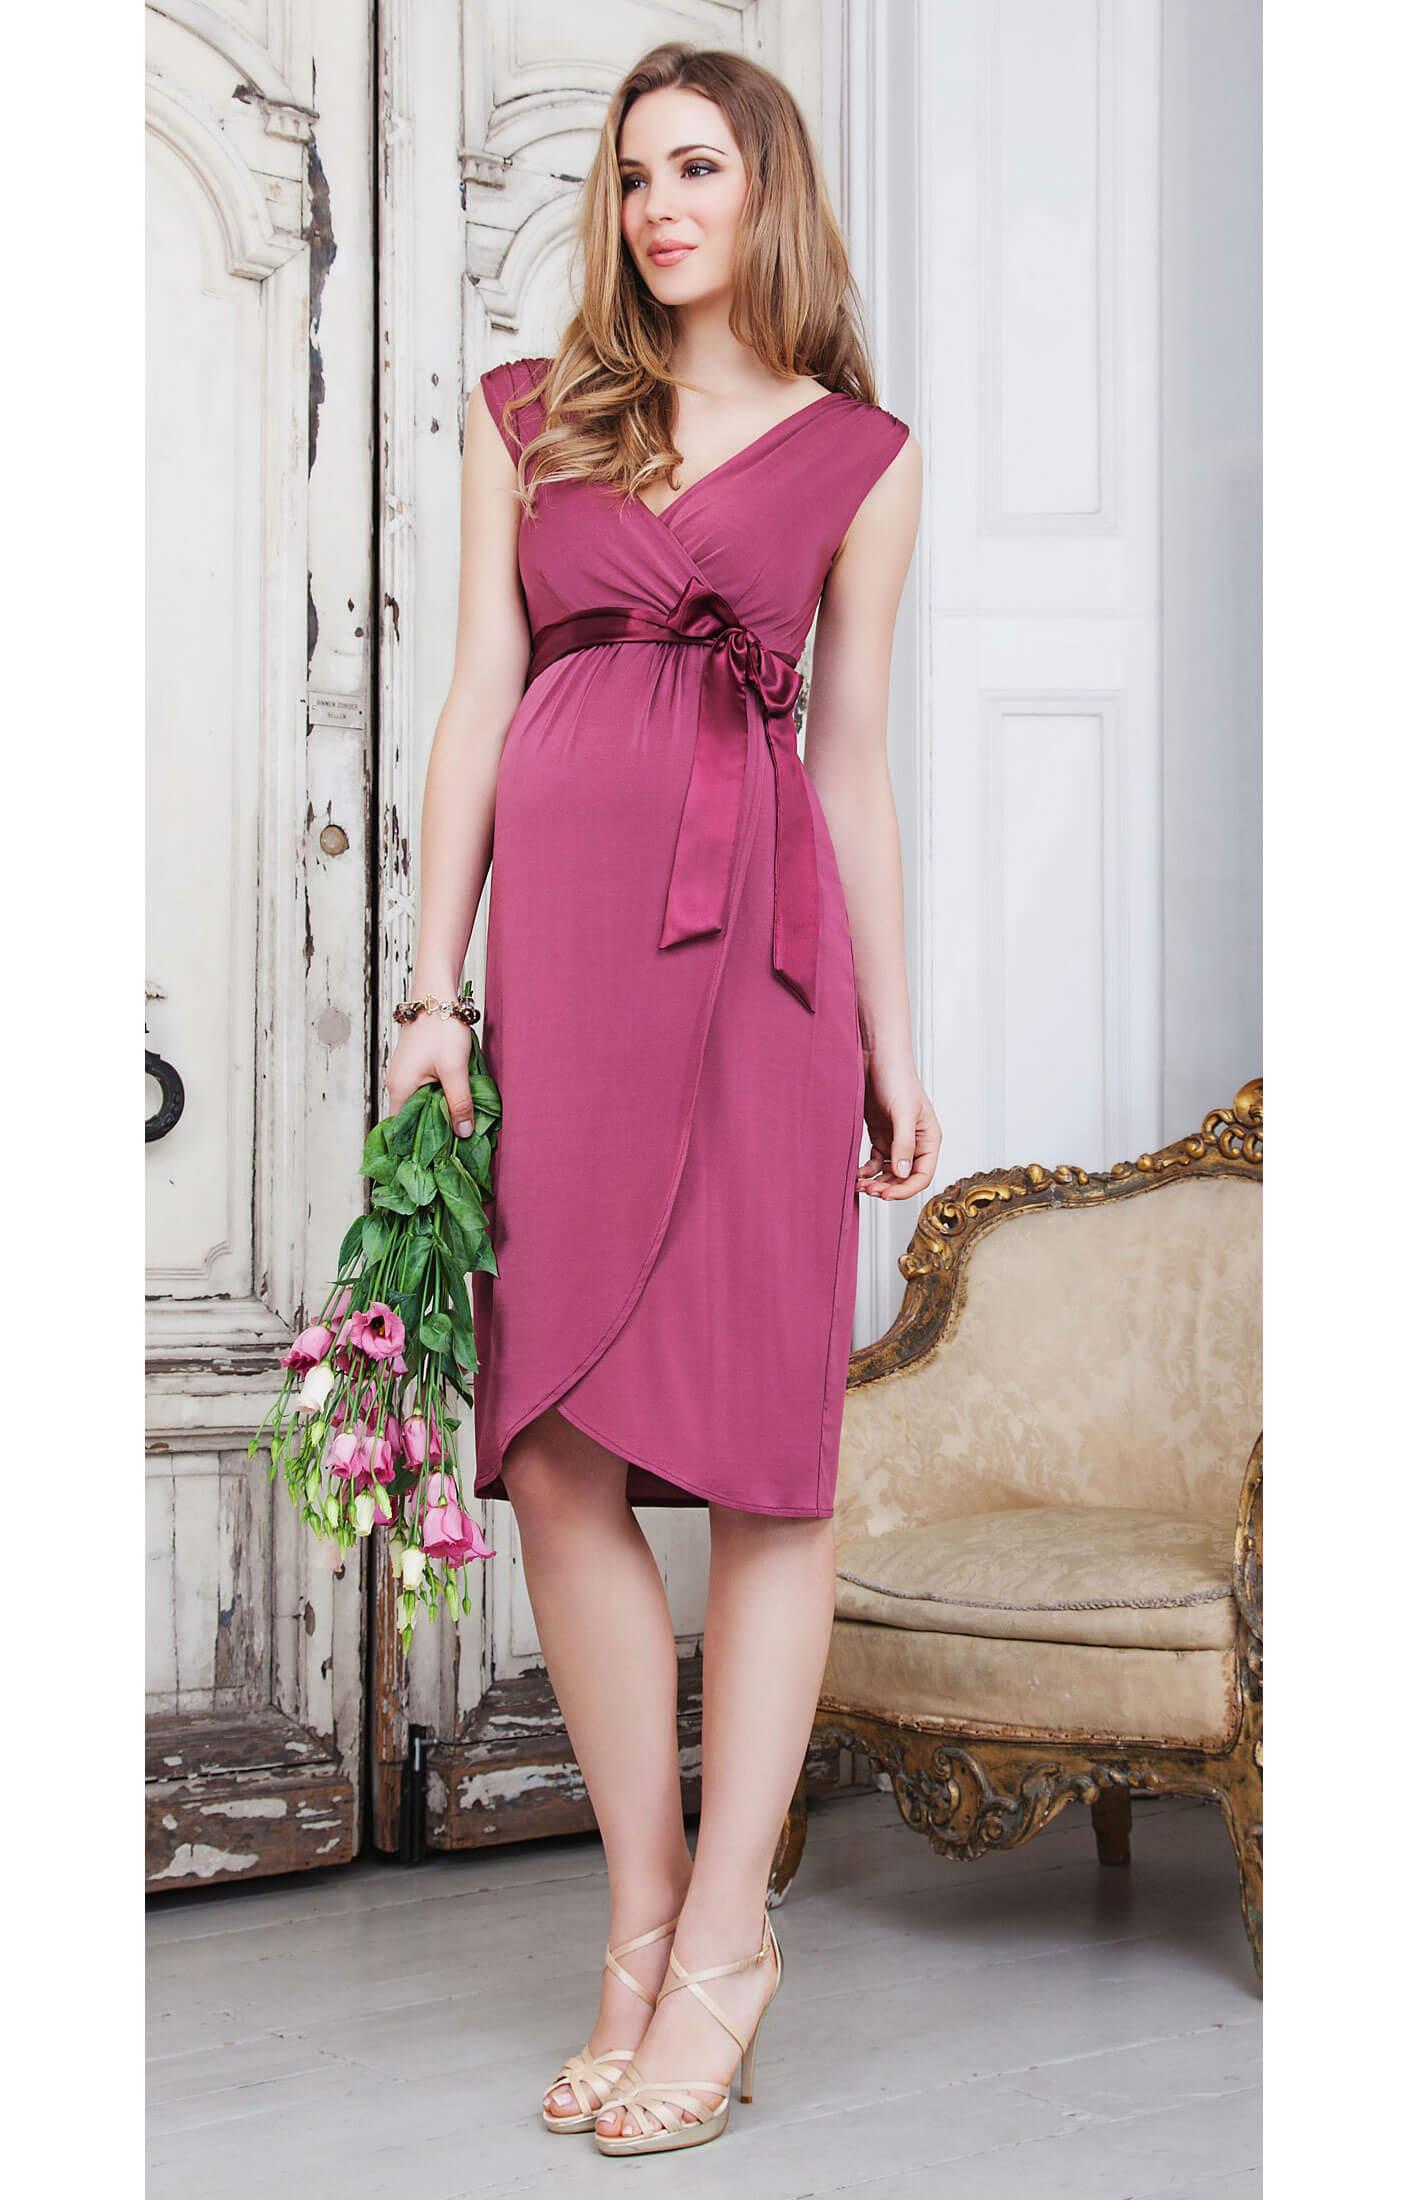 Bella maternity dress raspberry maternity wedding dresses bella maternity dress raspberry by tiffany rose ombrellifo Gallery